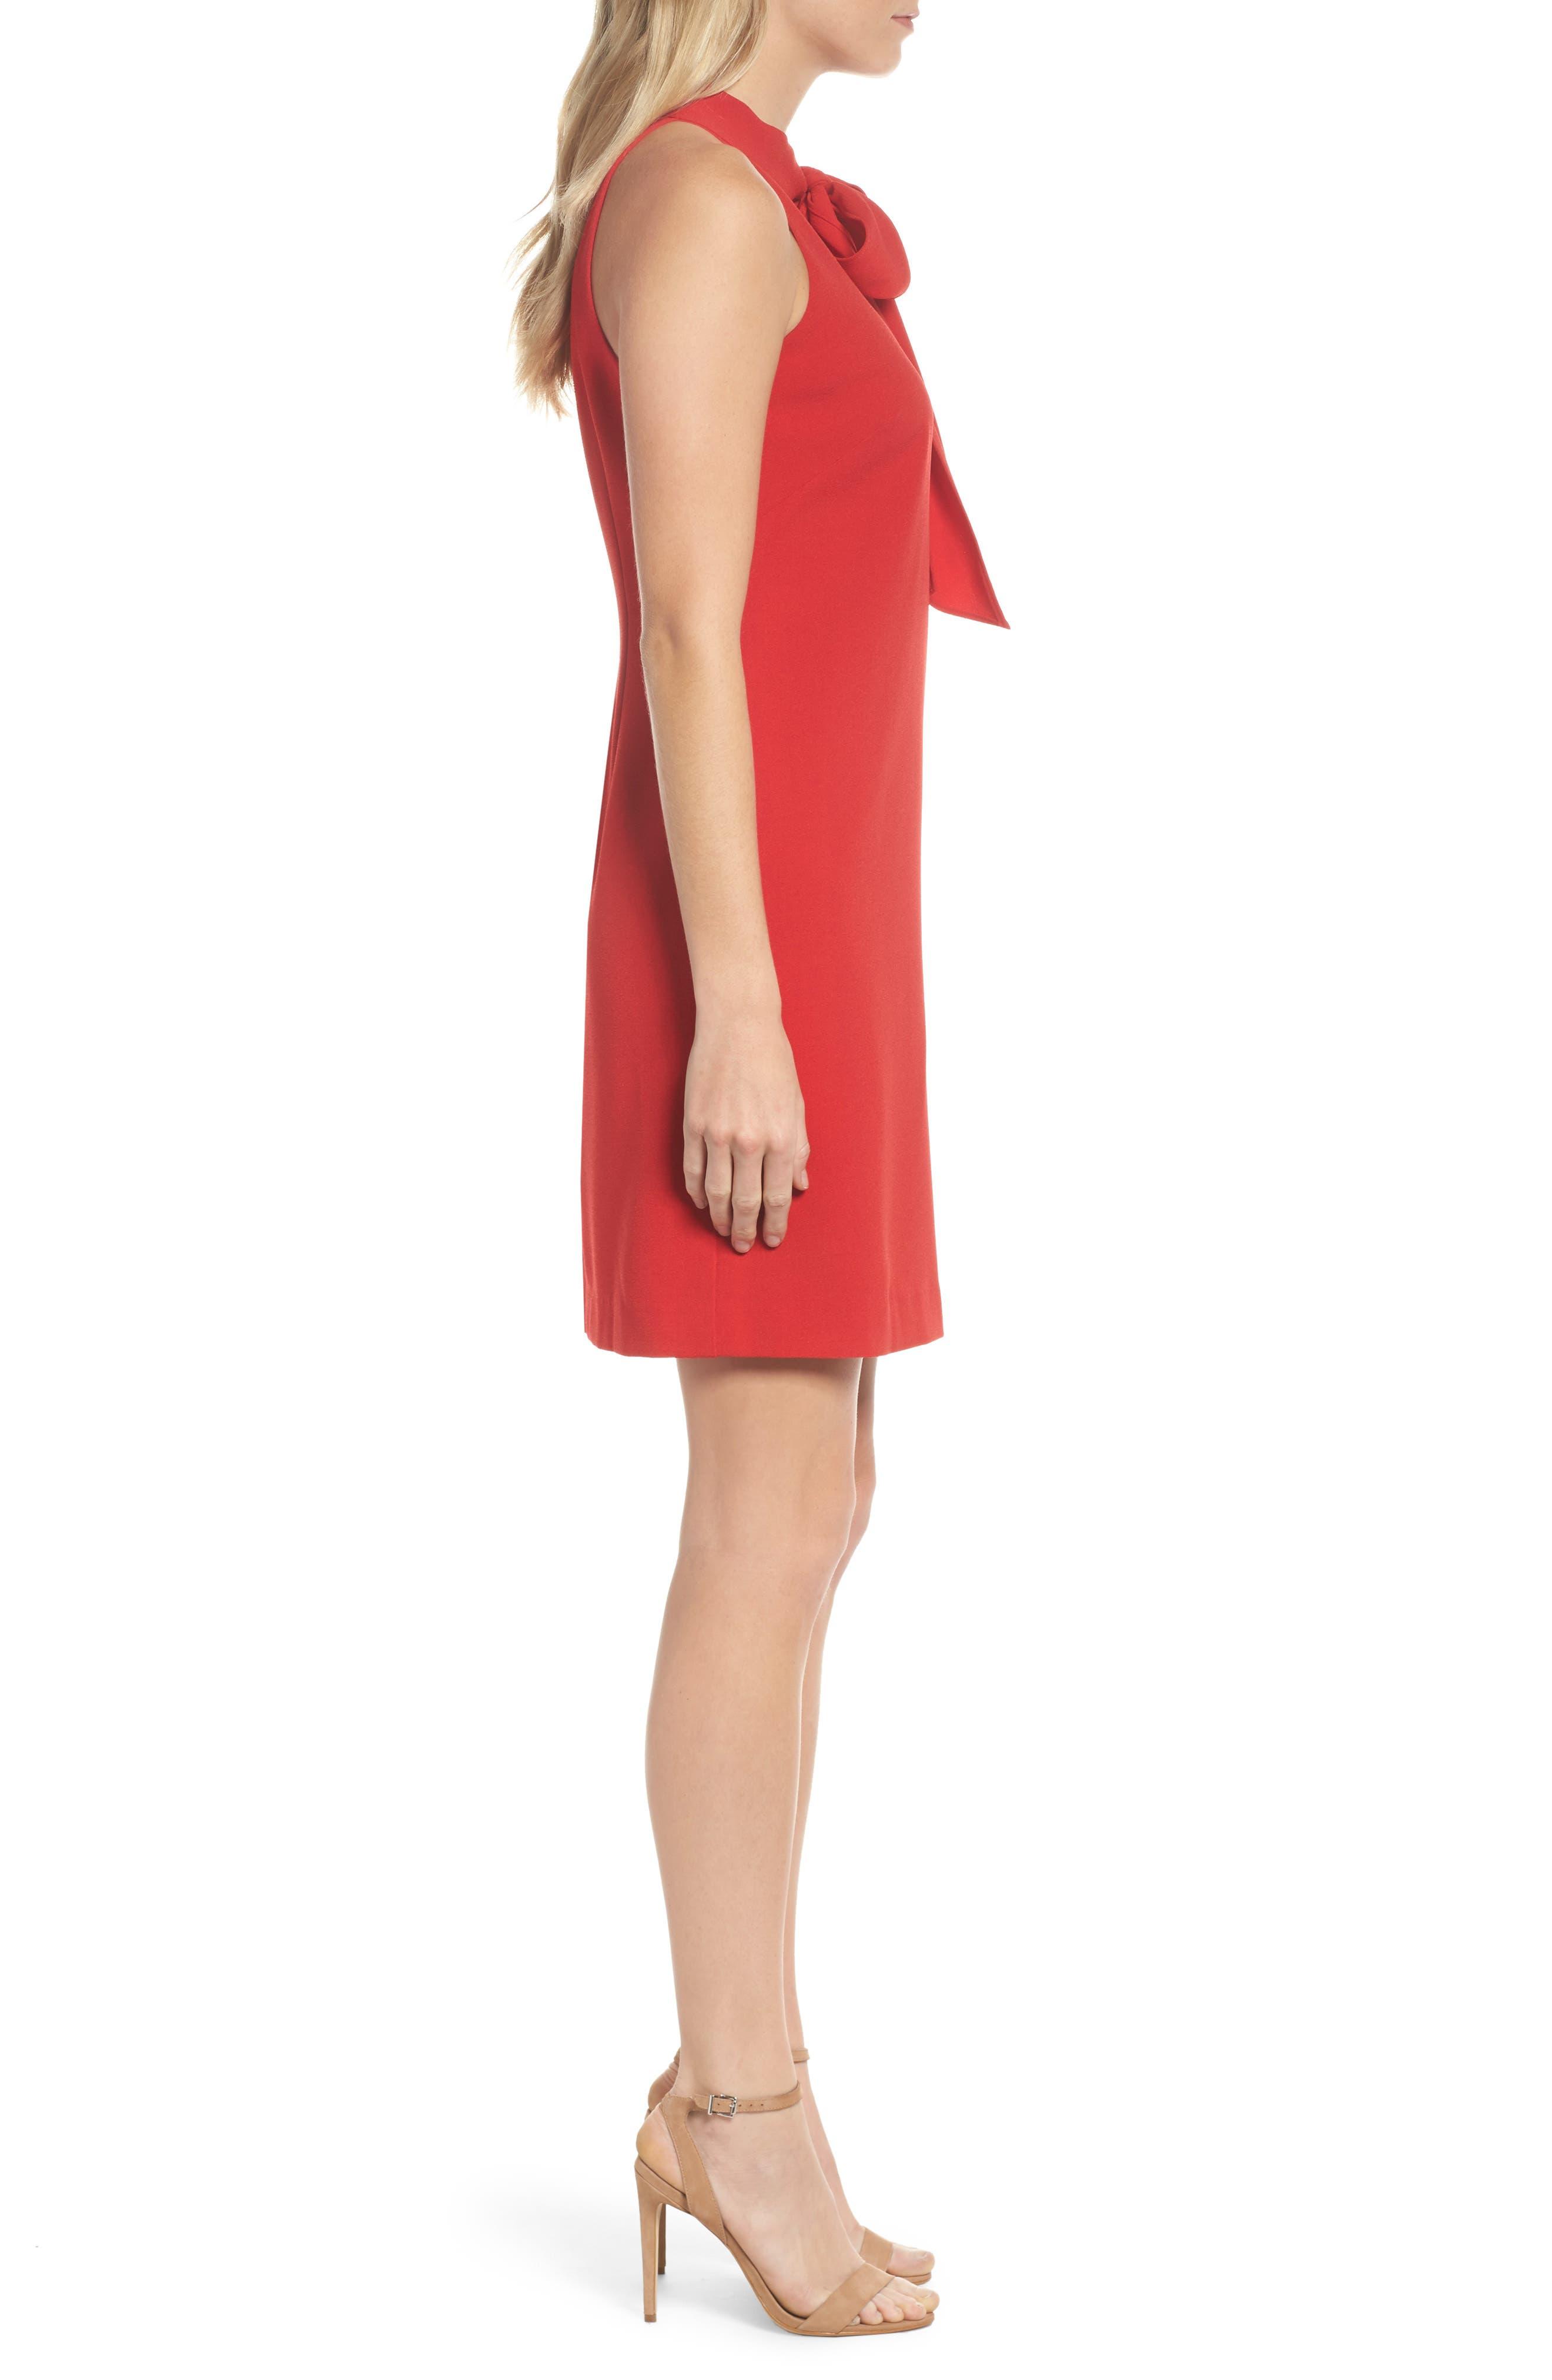 VINCE CAMUTO, Halter Tie Neck A-Line Dress, Alternate thumbnail 4, color, RED